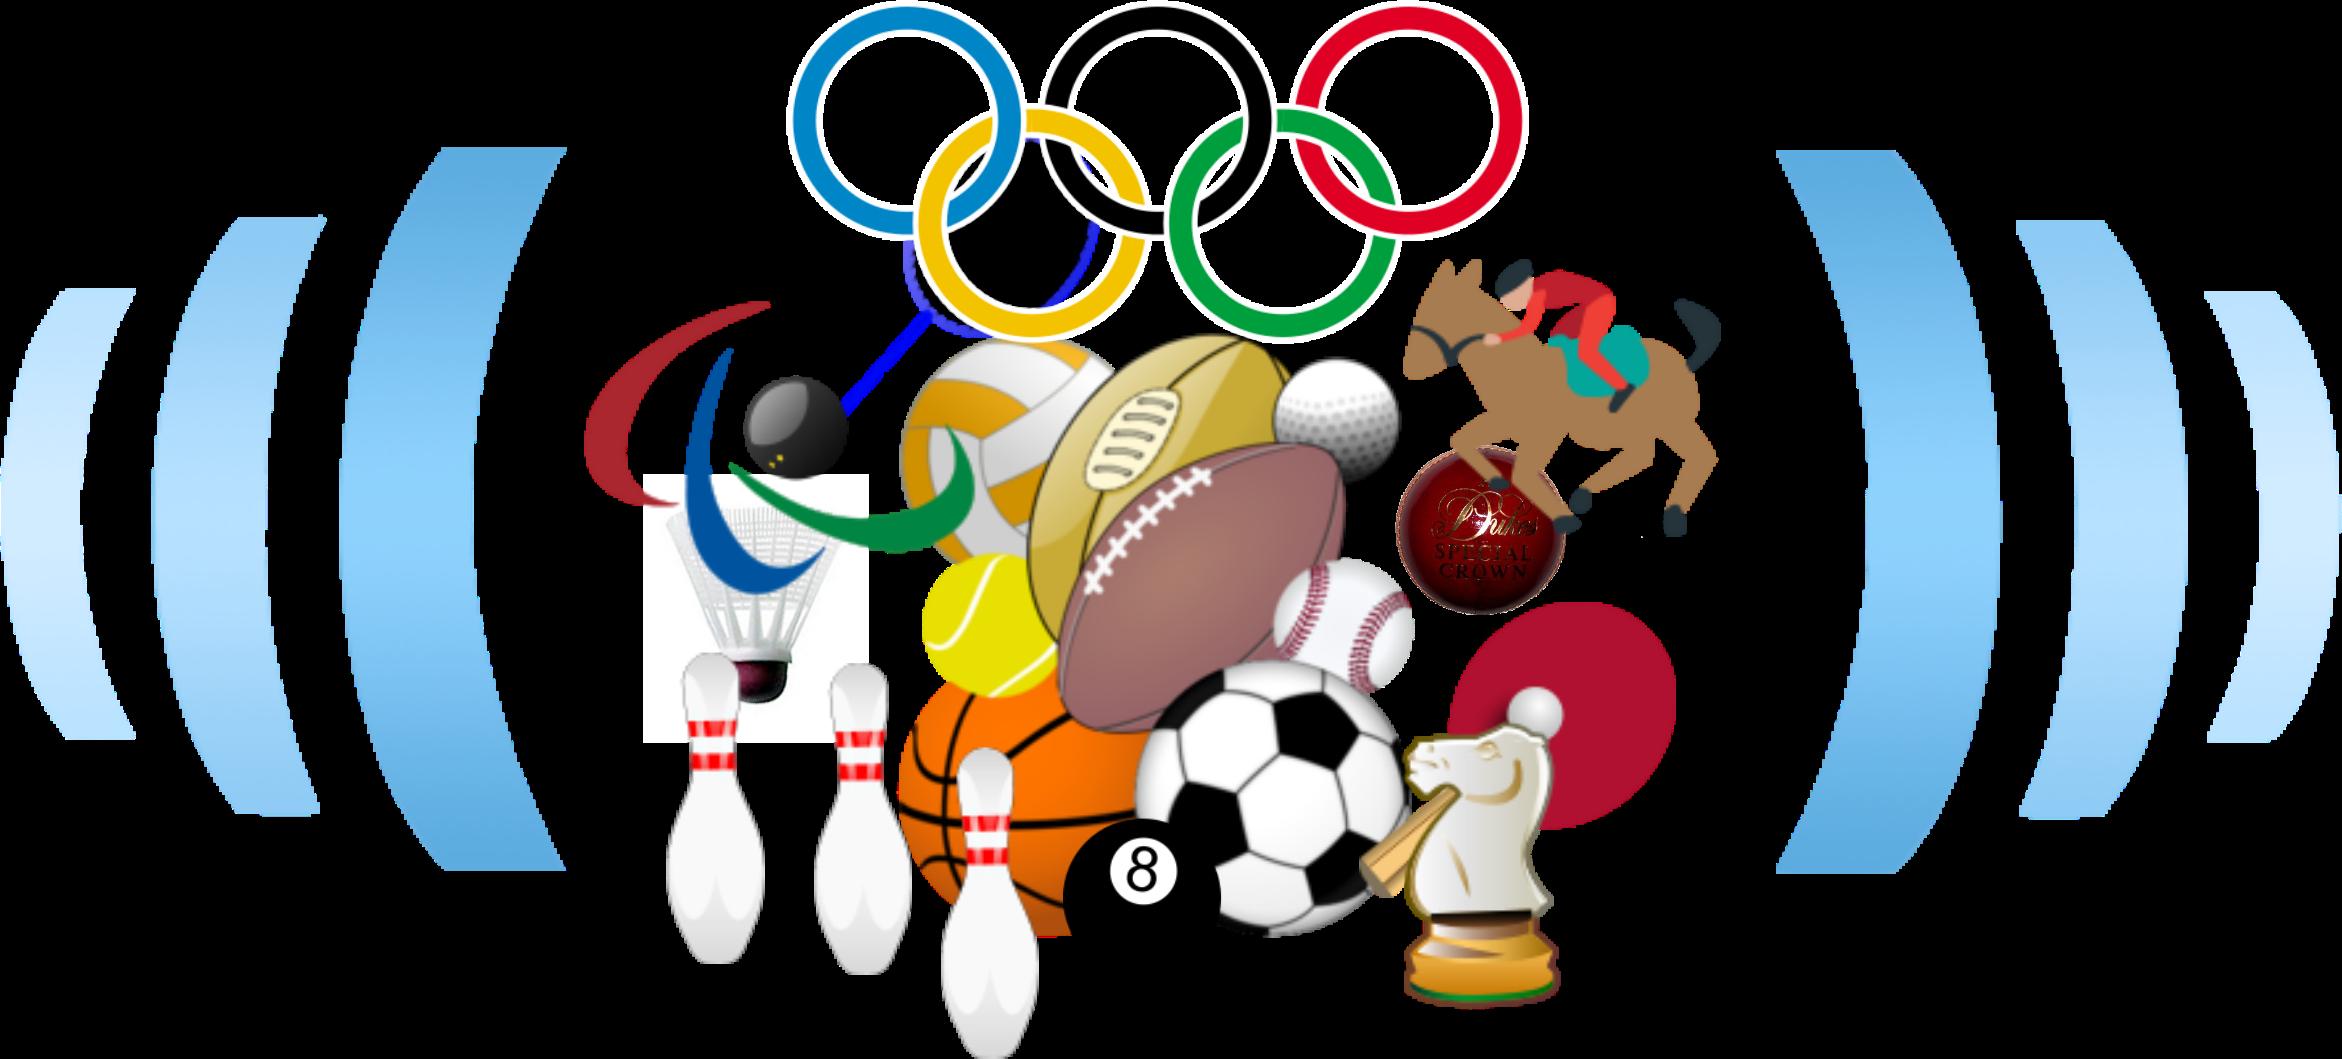 File:Wikinews Sports.png.